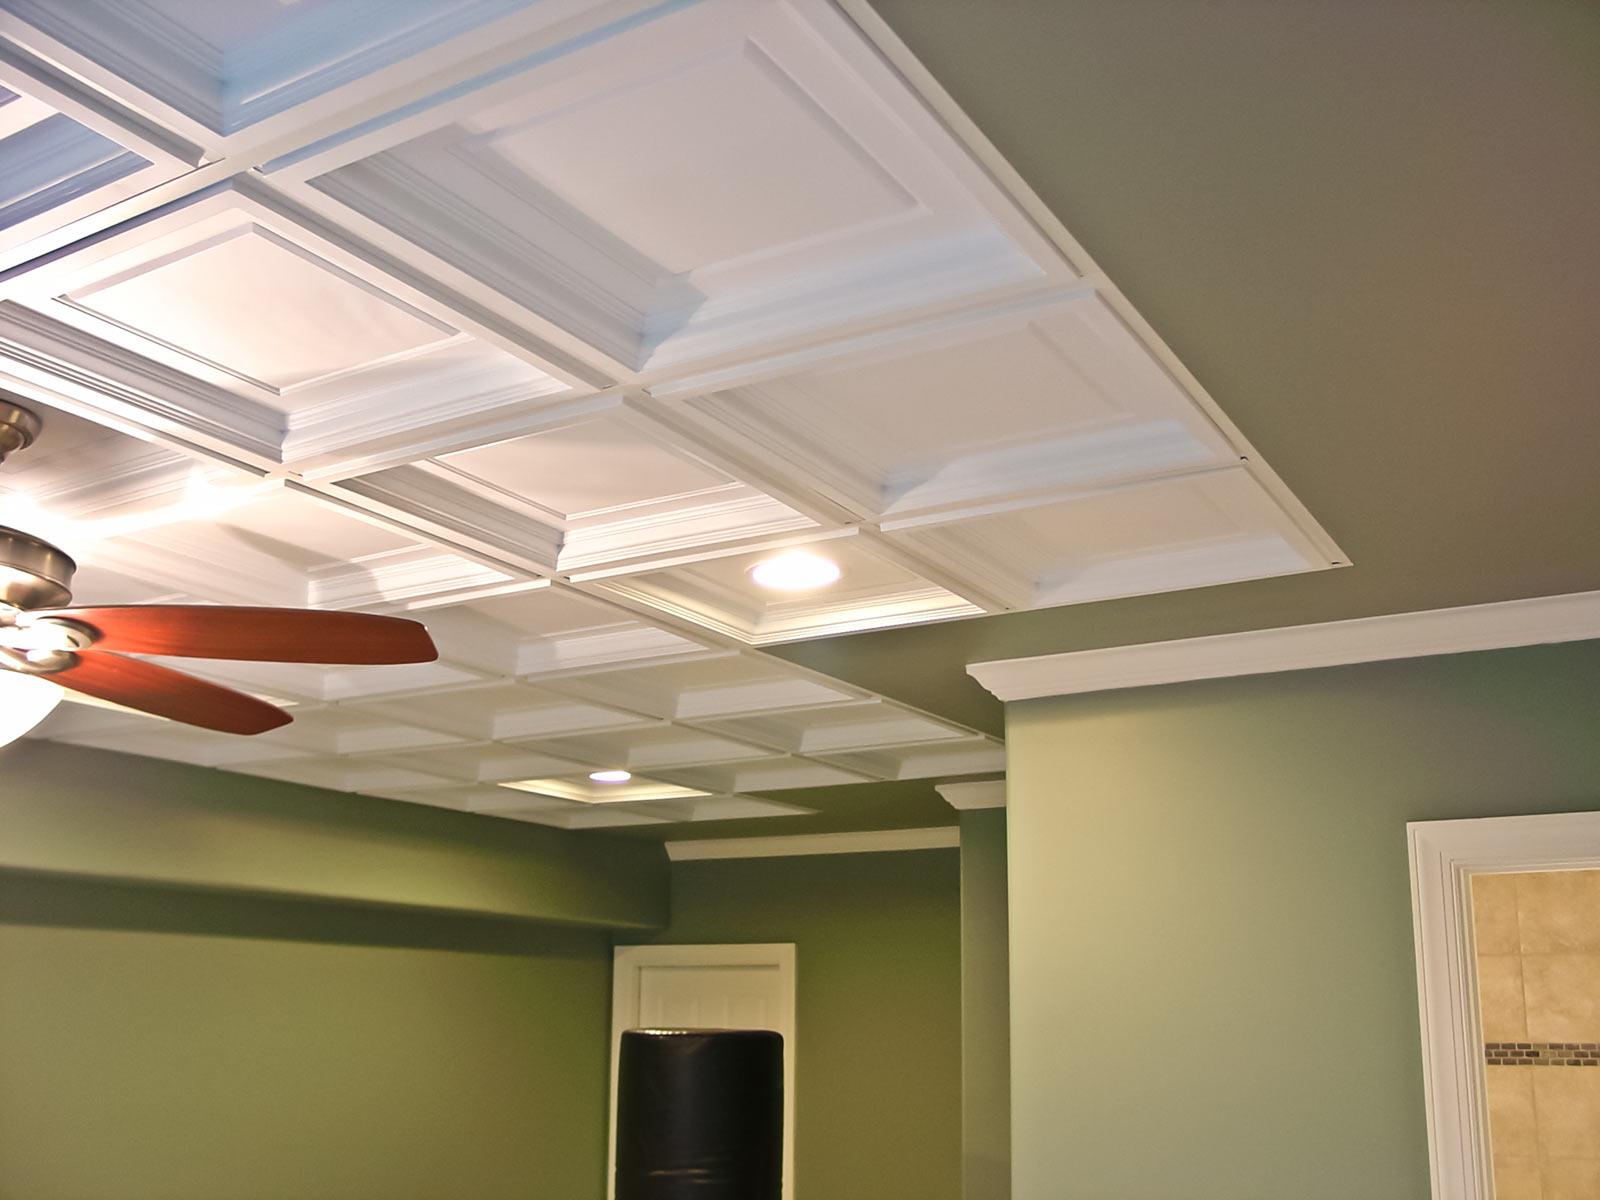 Drop Ceiling Tiles 2x4 Ideas — Charter Home Ideas